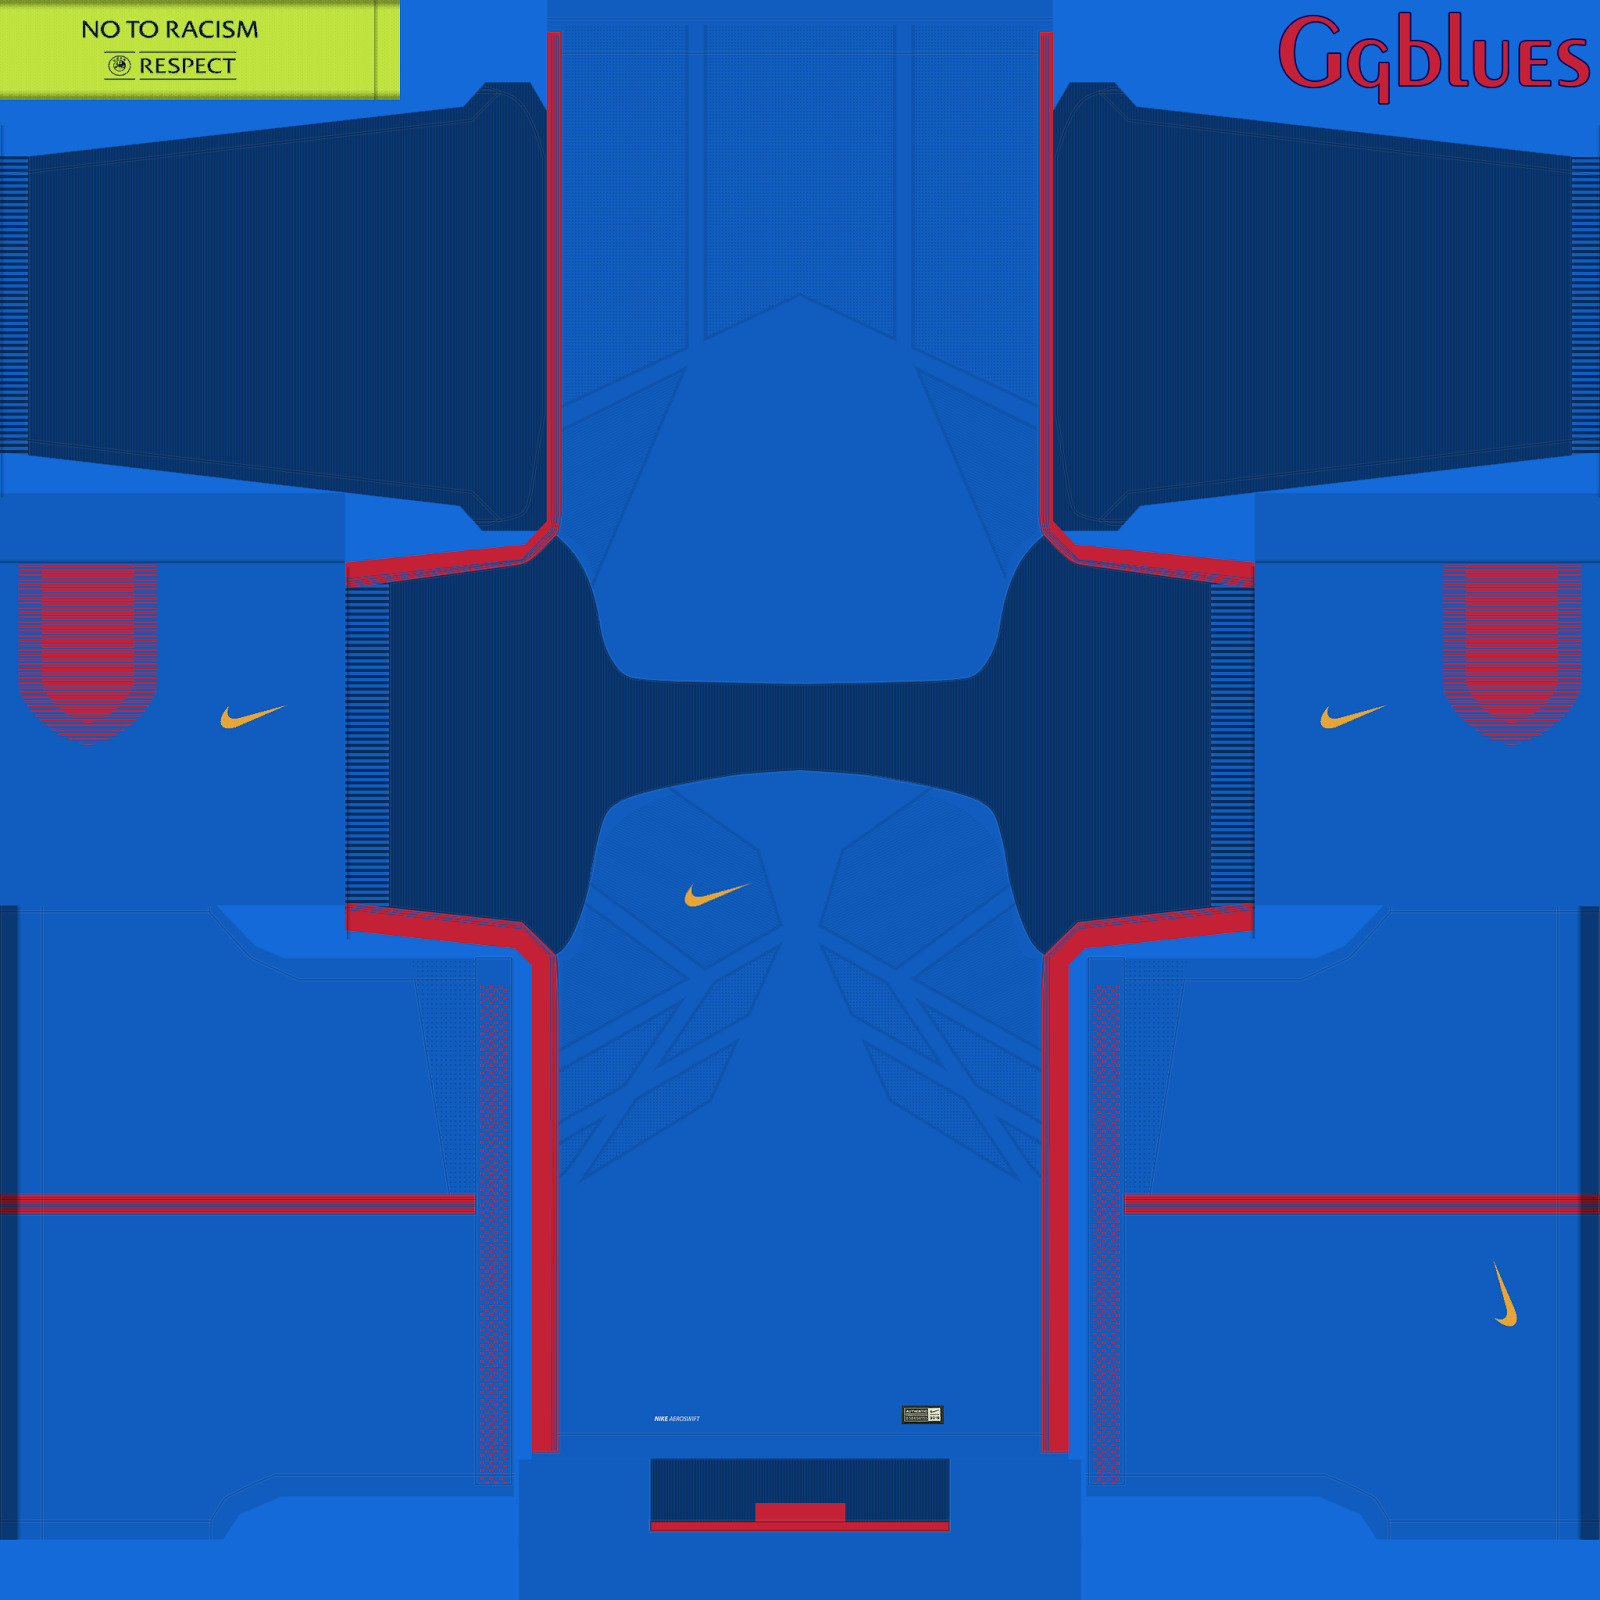 PES 2016-2017 Nike Aeroswift PSD Template By Ggblues